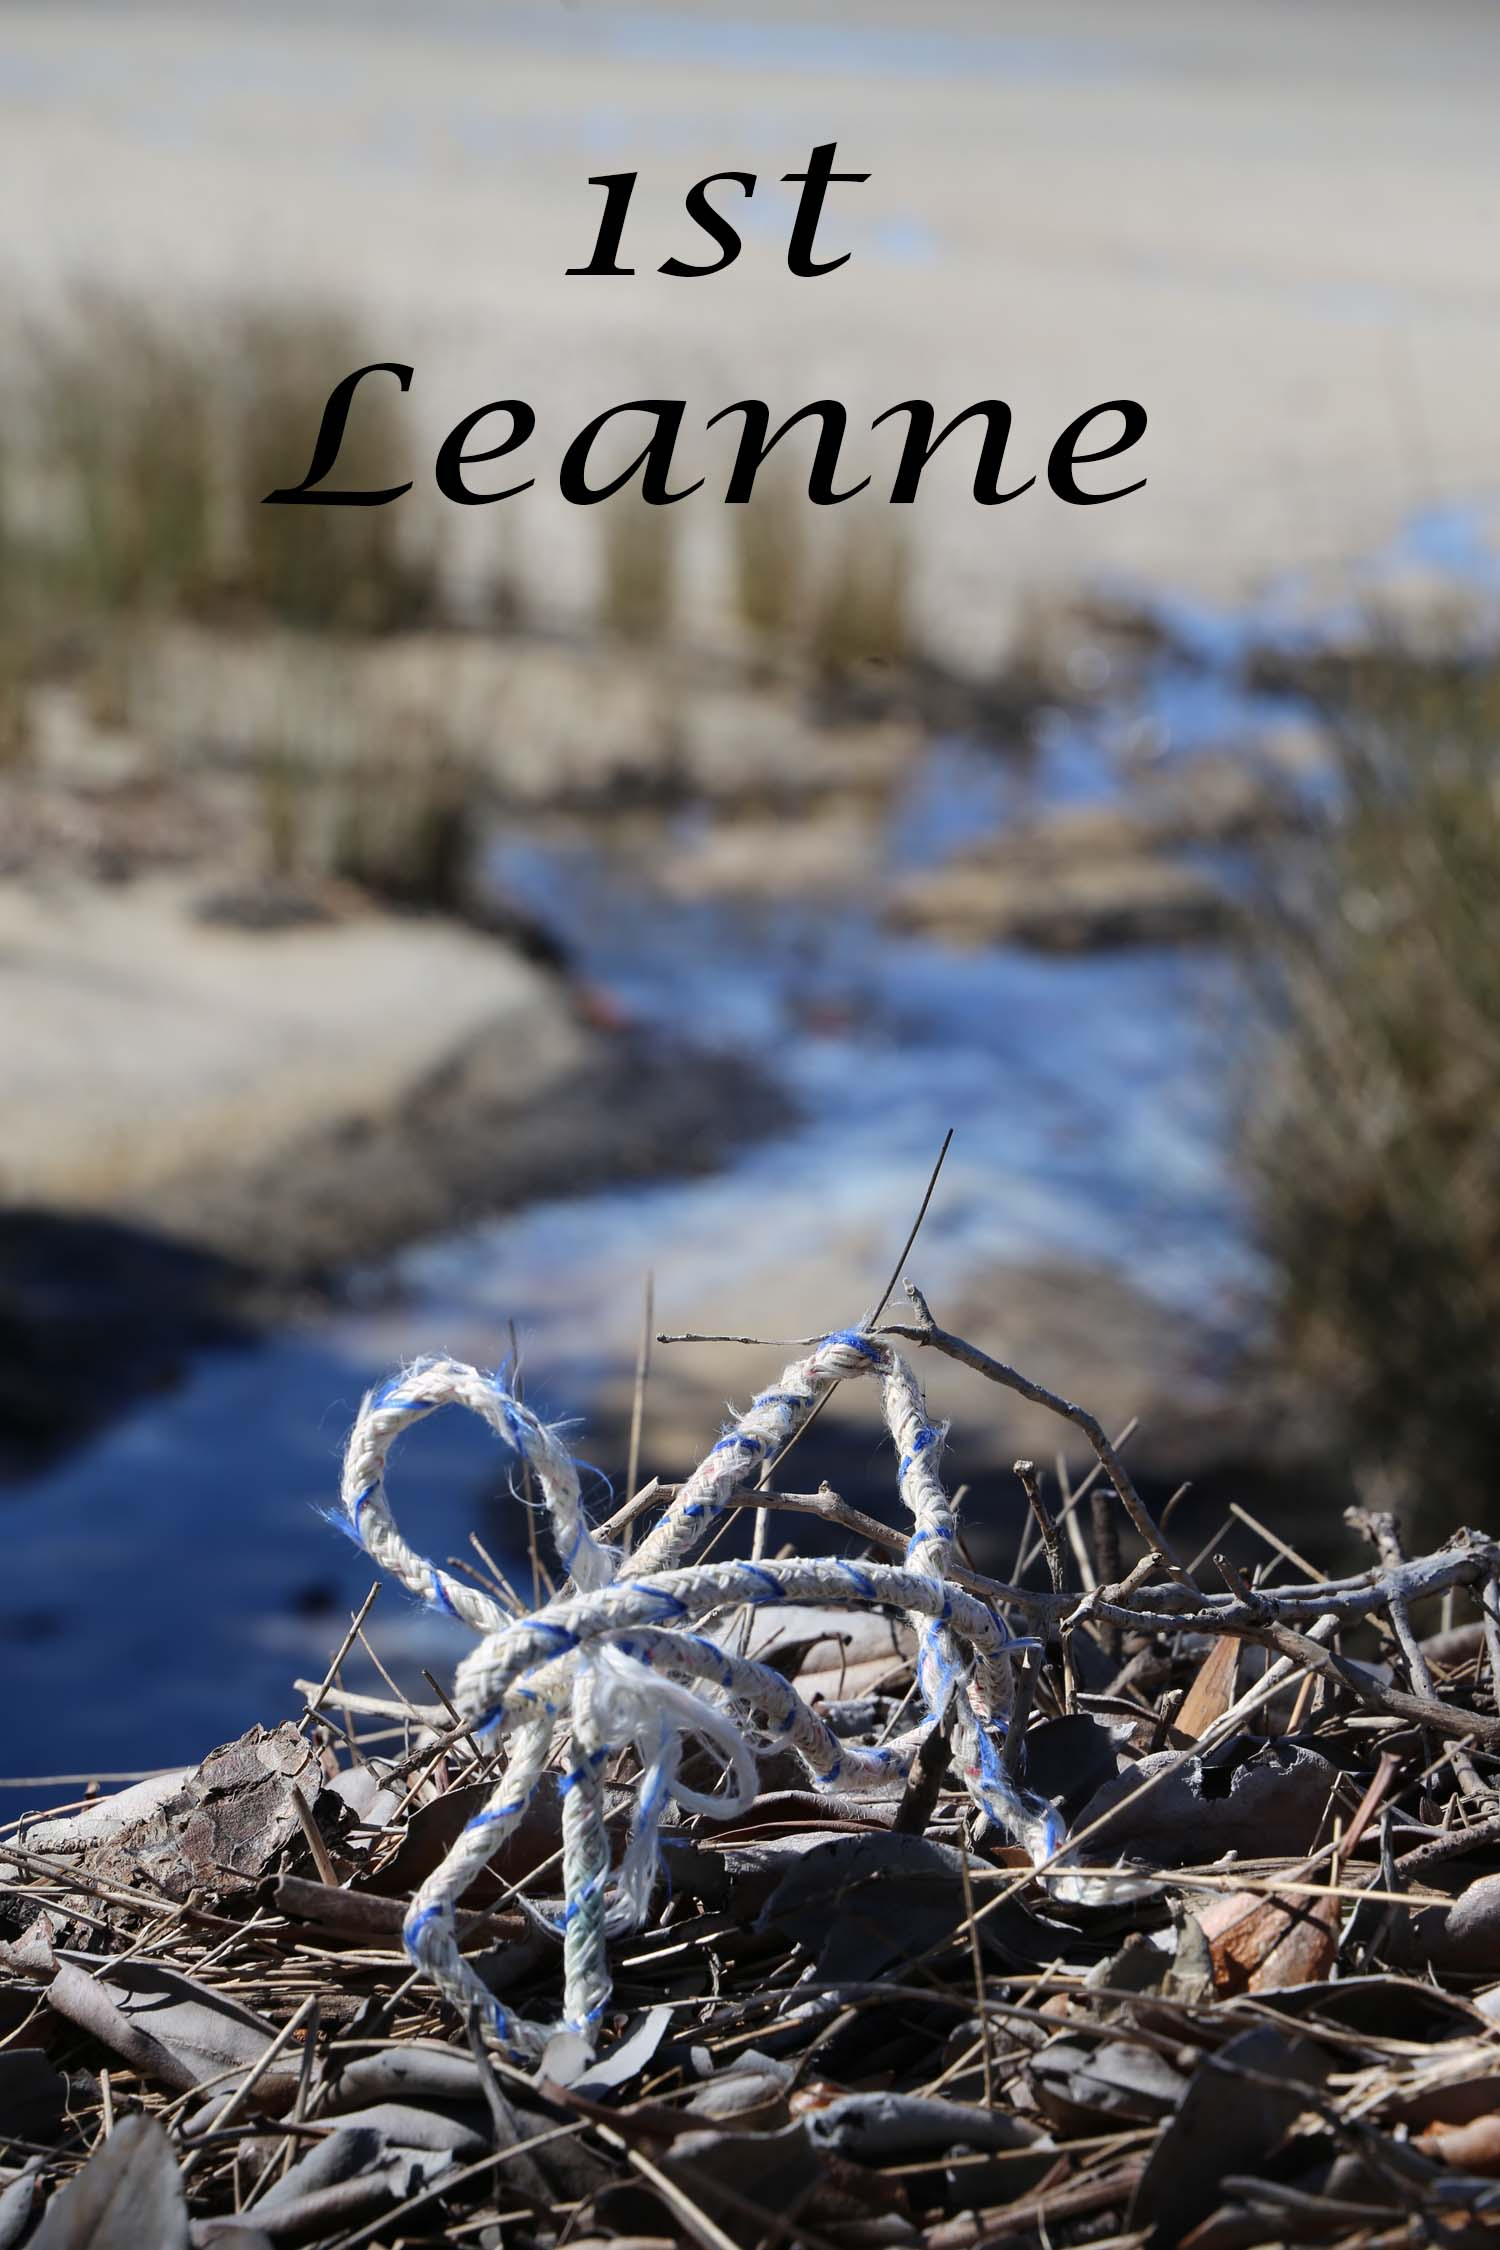 Environ Trash 1st Leanne